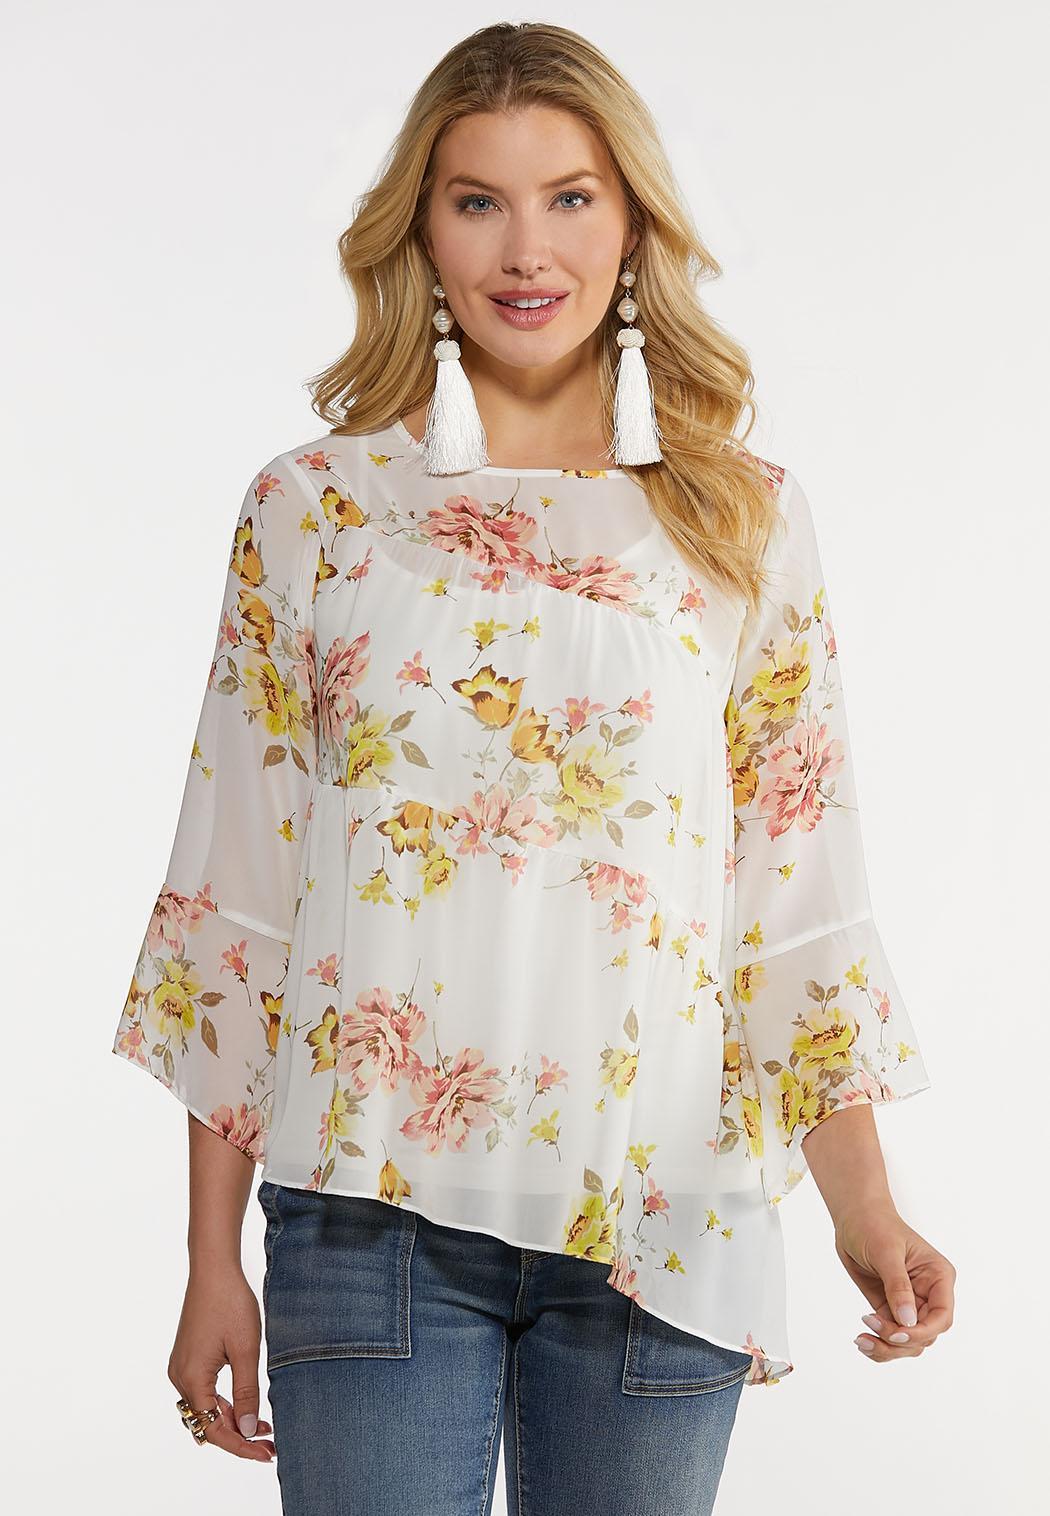 Plus Size Asymmetrical Floral Top